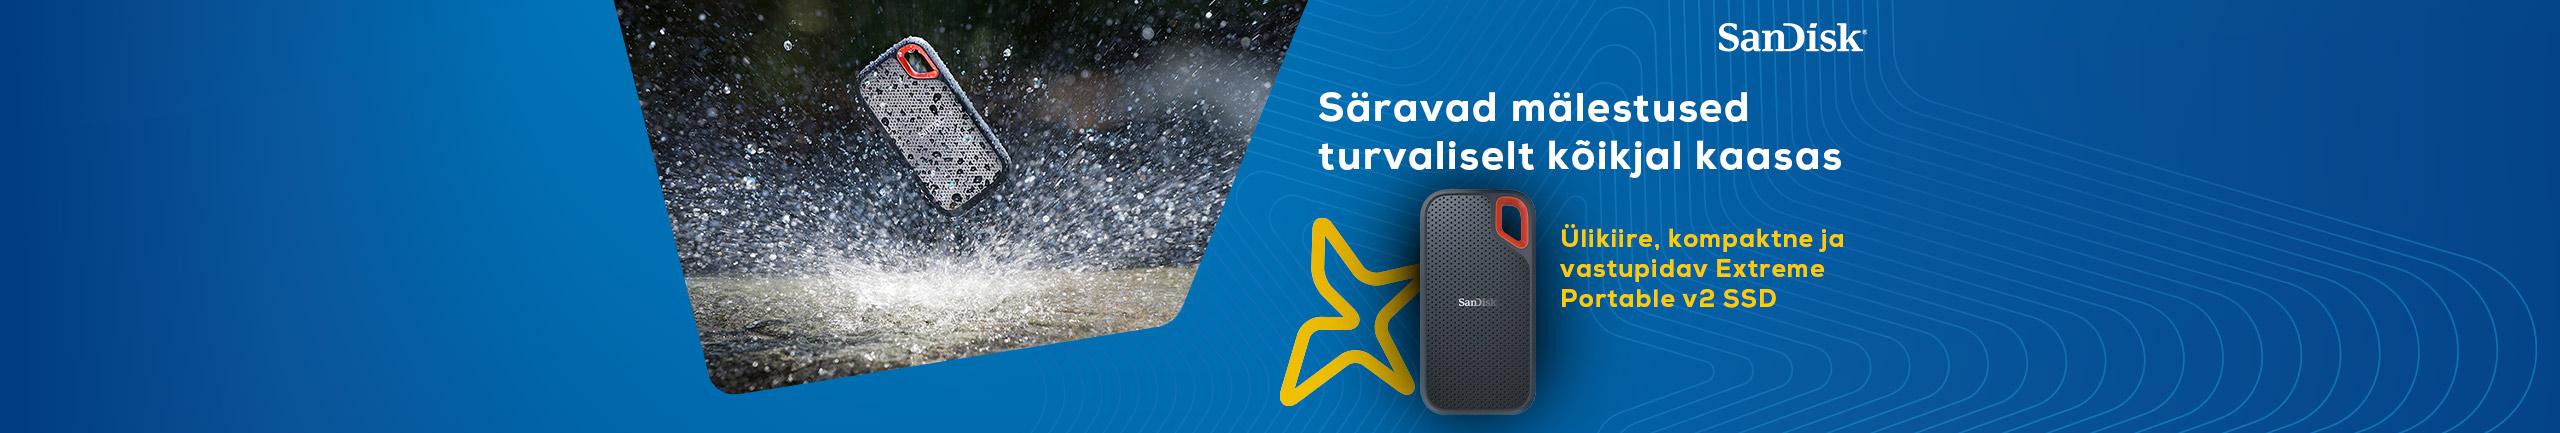 Sandisk Extreme Portable V2